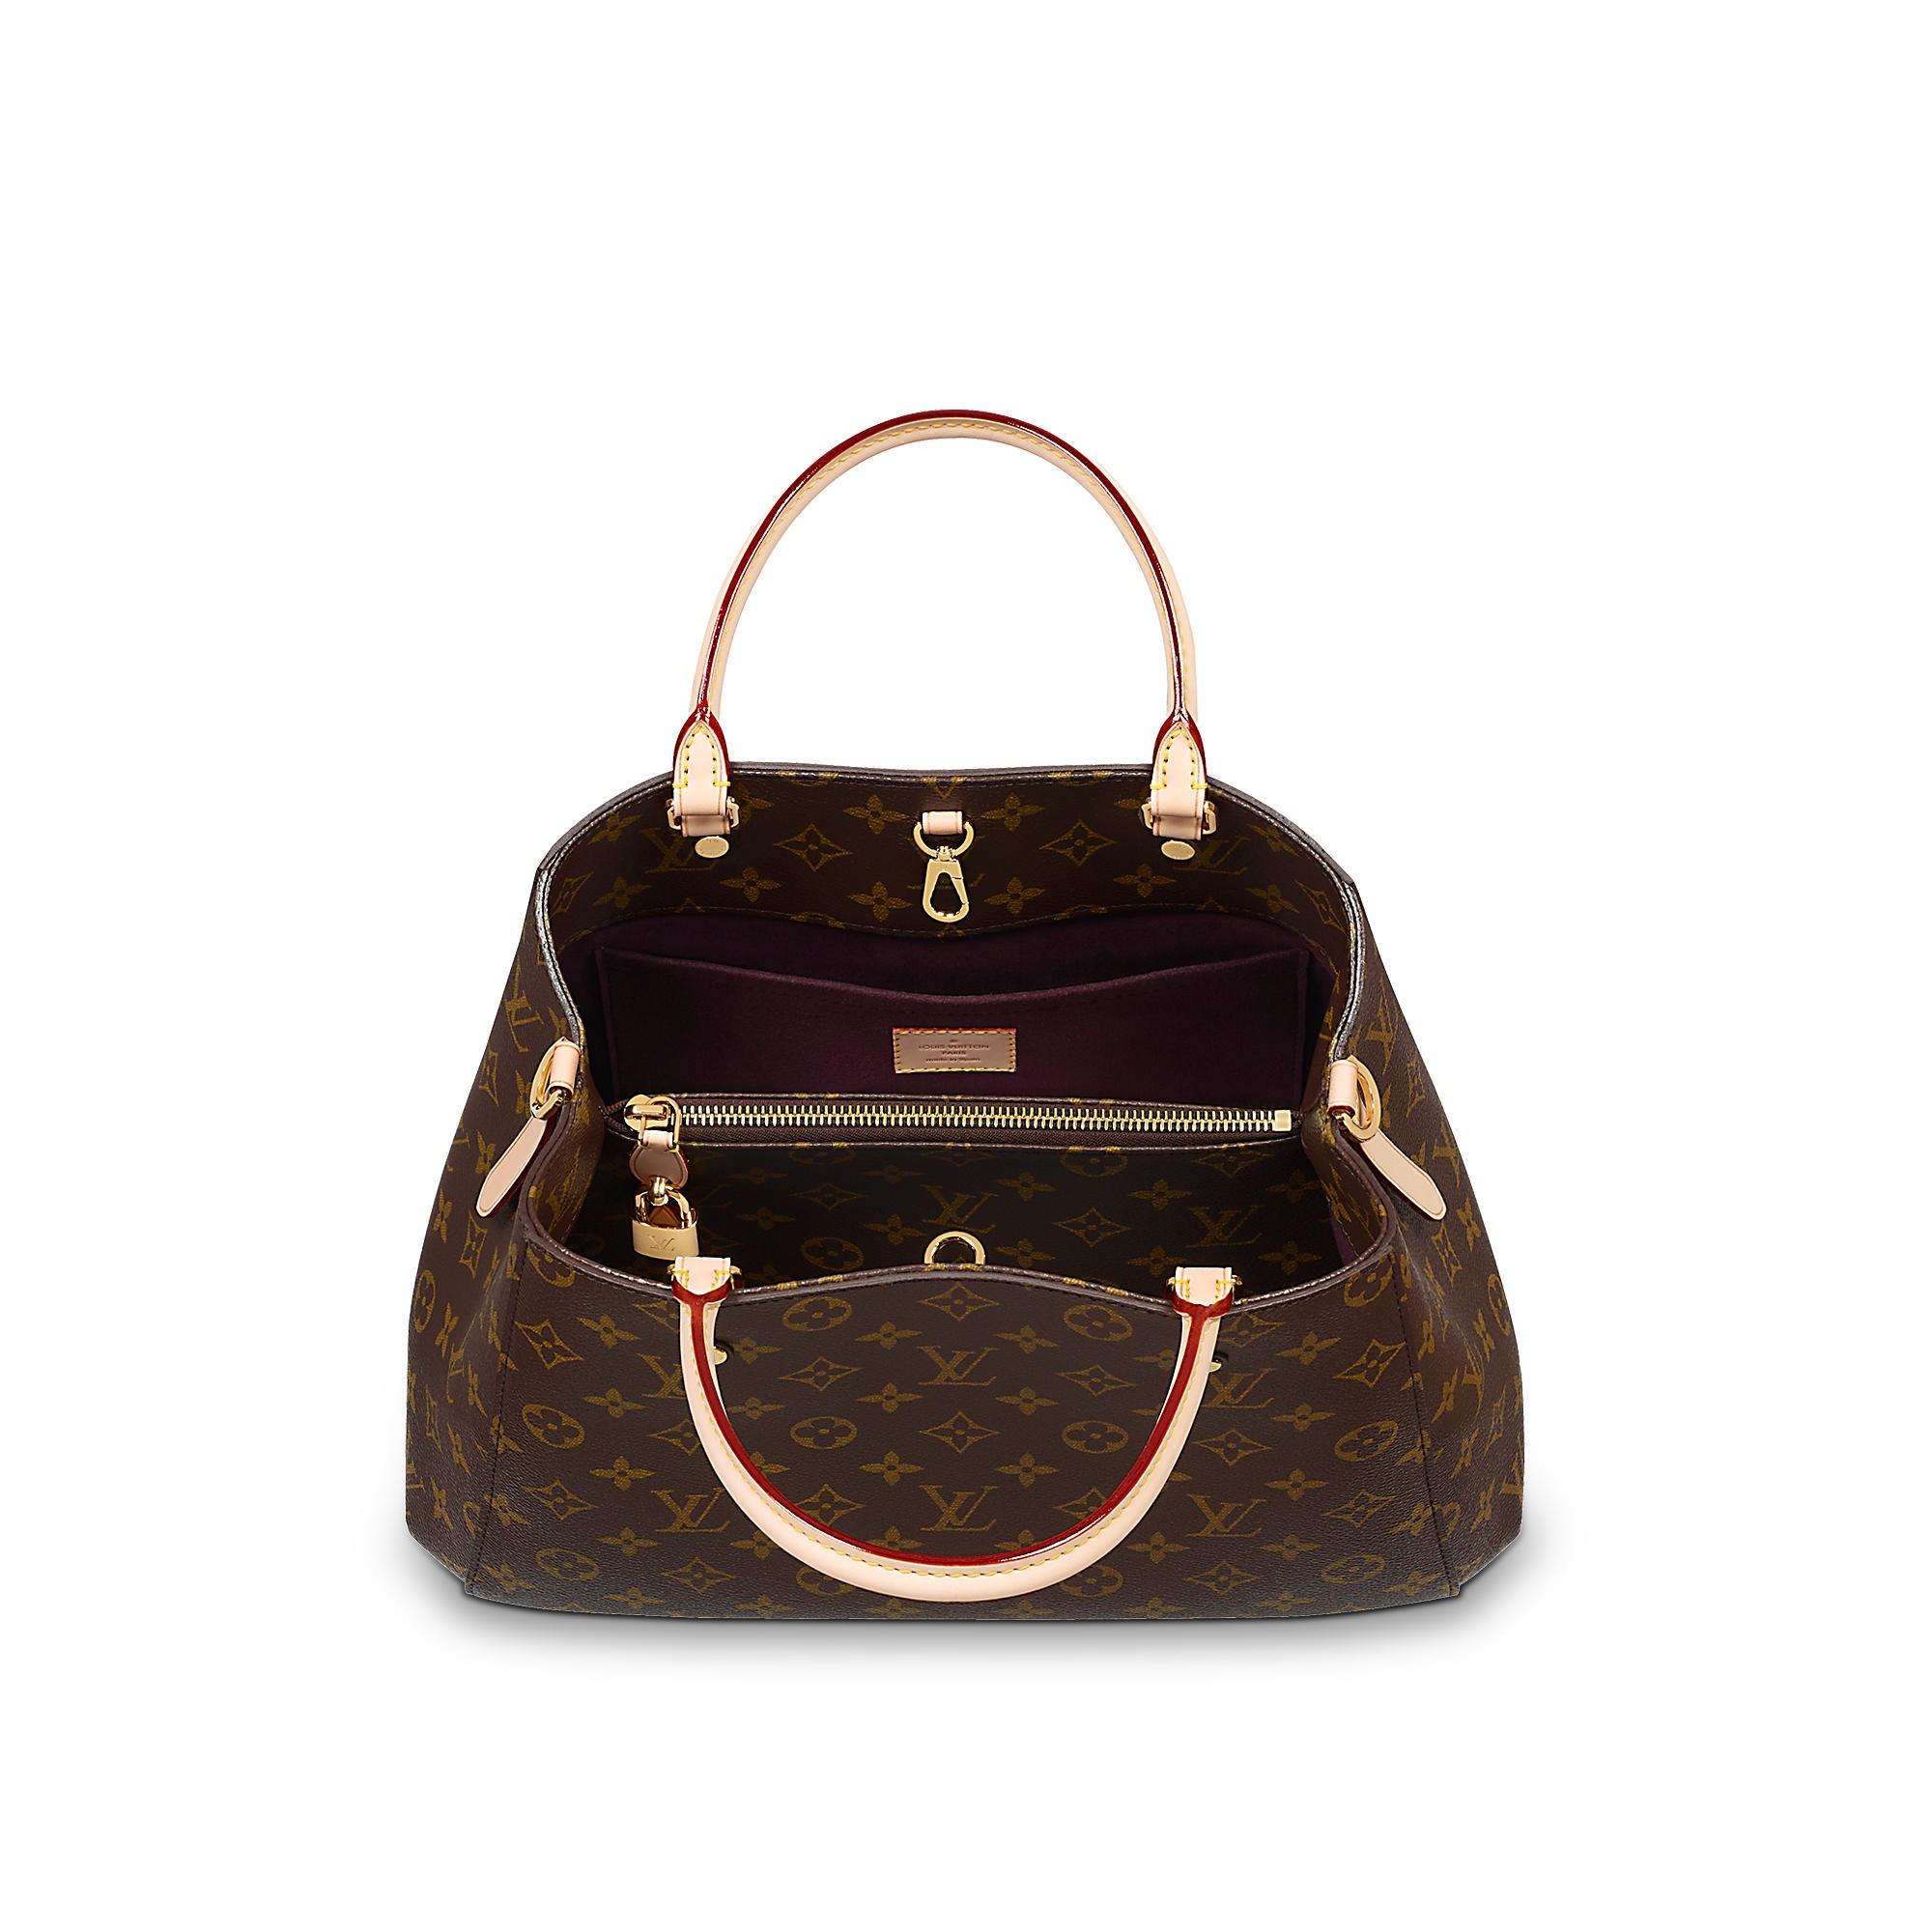 louis vuitton monogram handbag bag recommend model buya. Black Bedroom Furniture Sets. Home Design Ideas